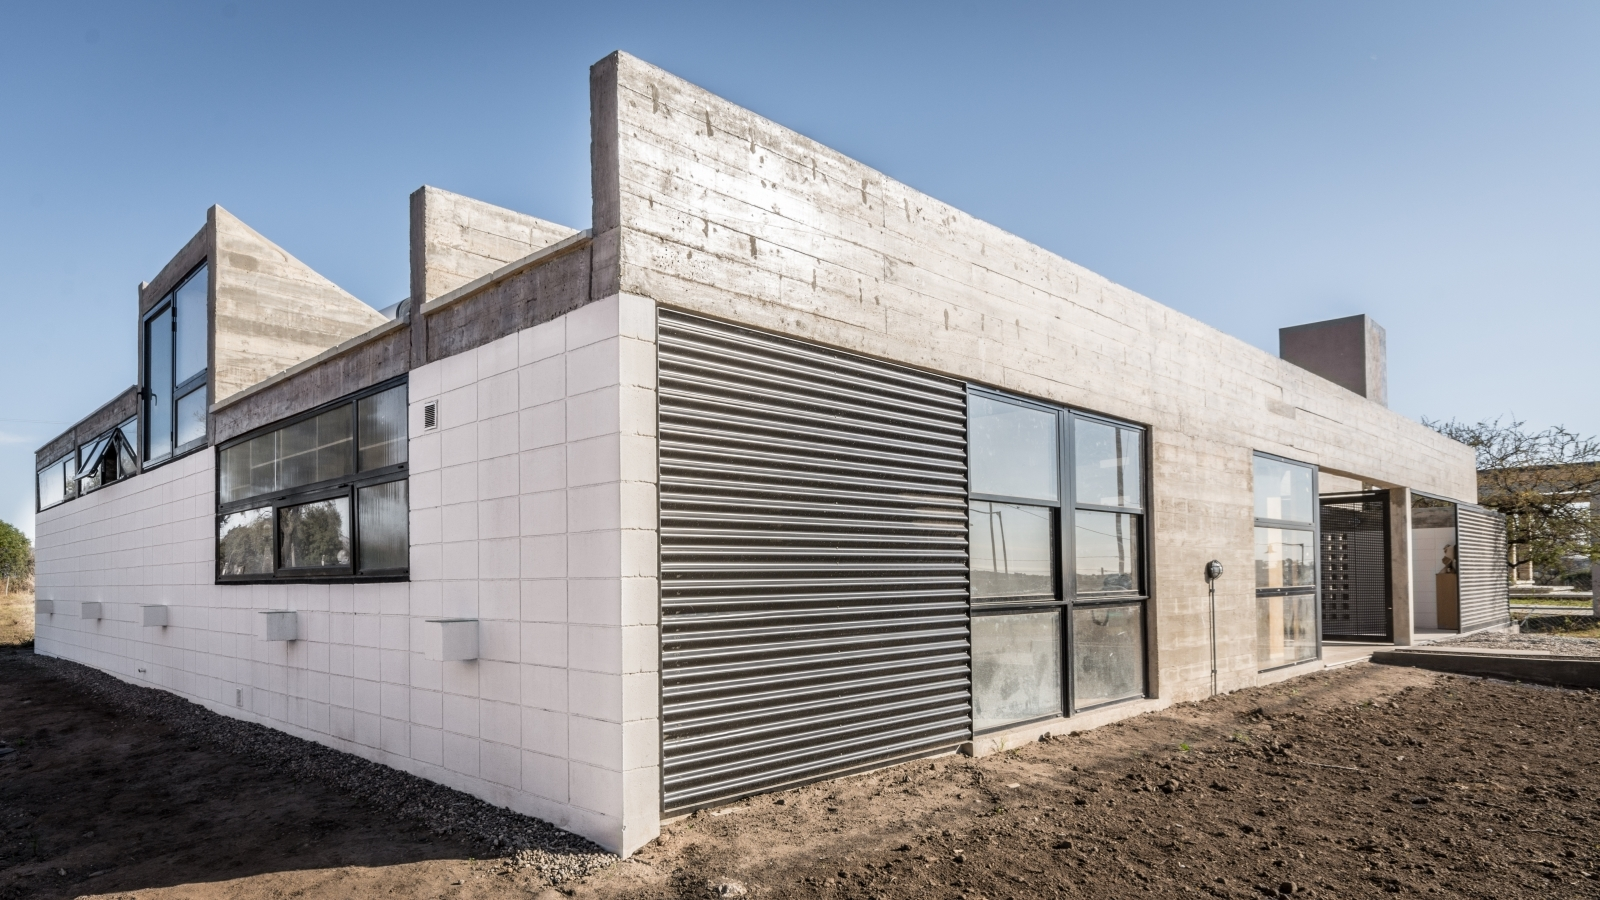 Casa corzuelas manuel gonzalez veglia dolores menso for Plataforma arquitectura